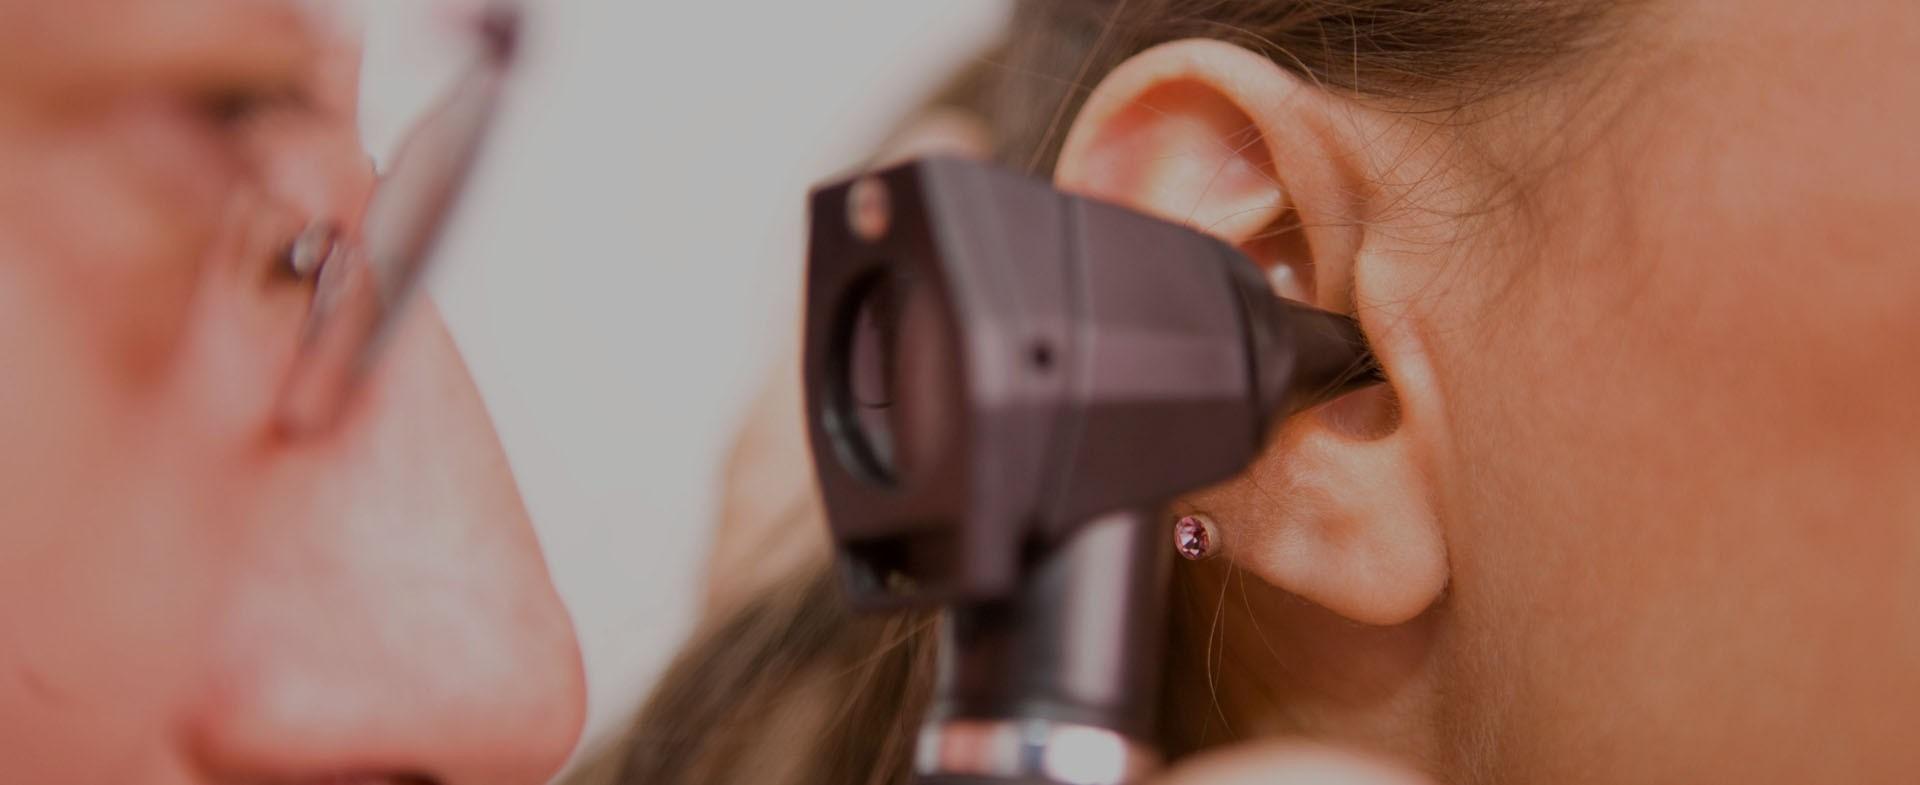 A doctor giving an ear exam